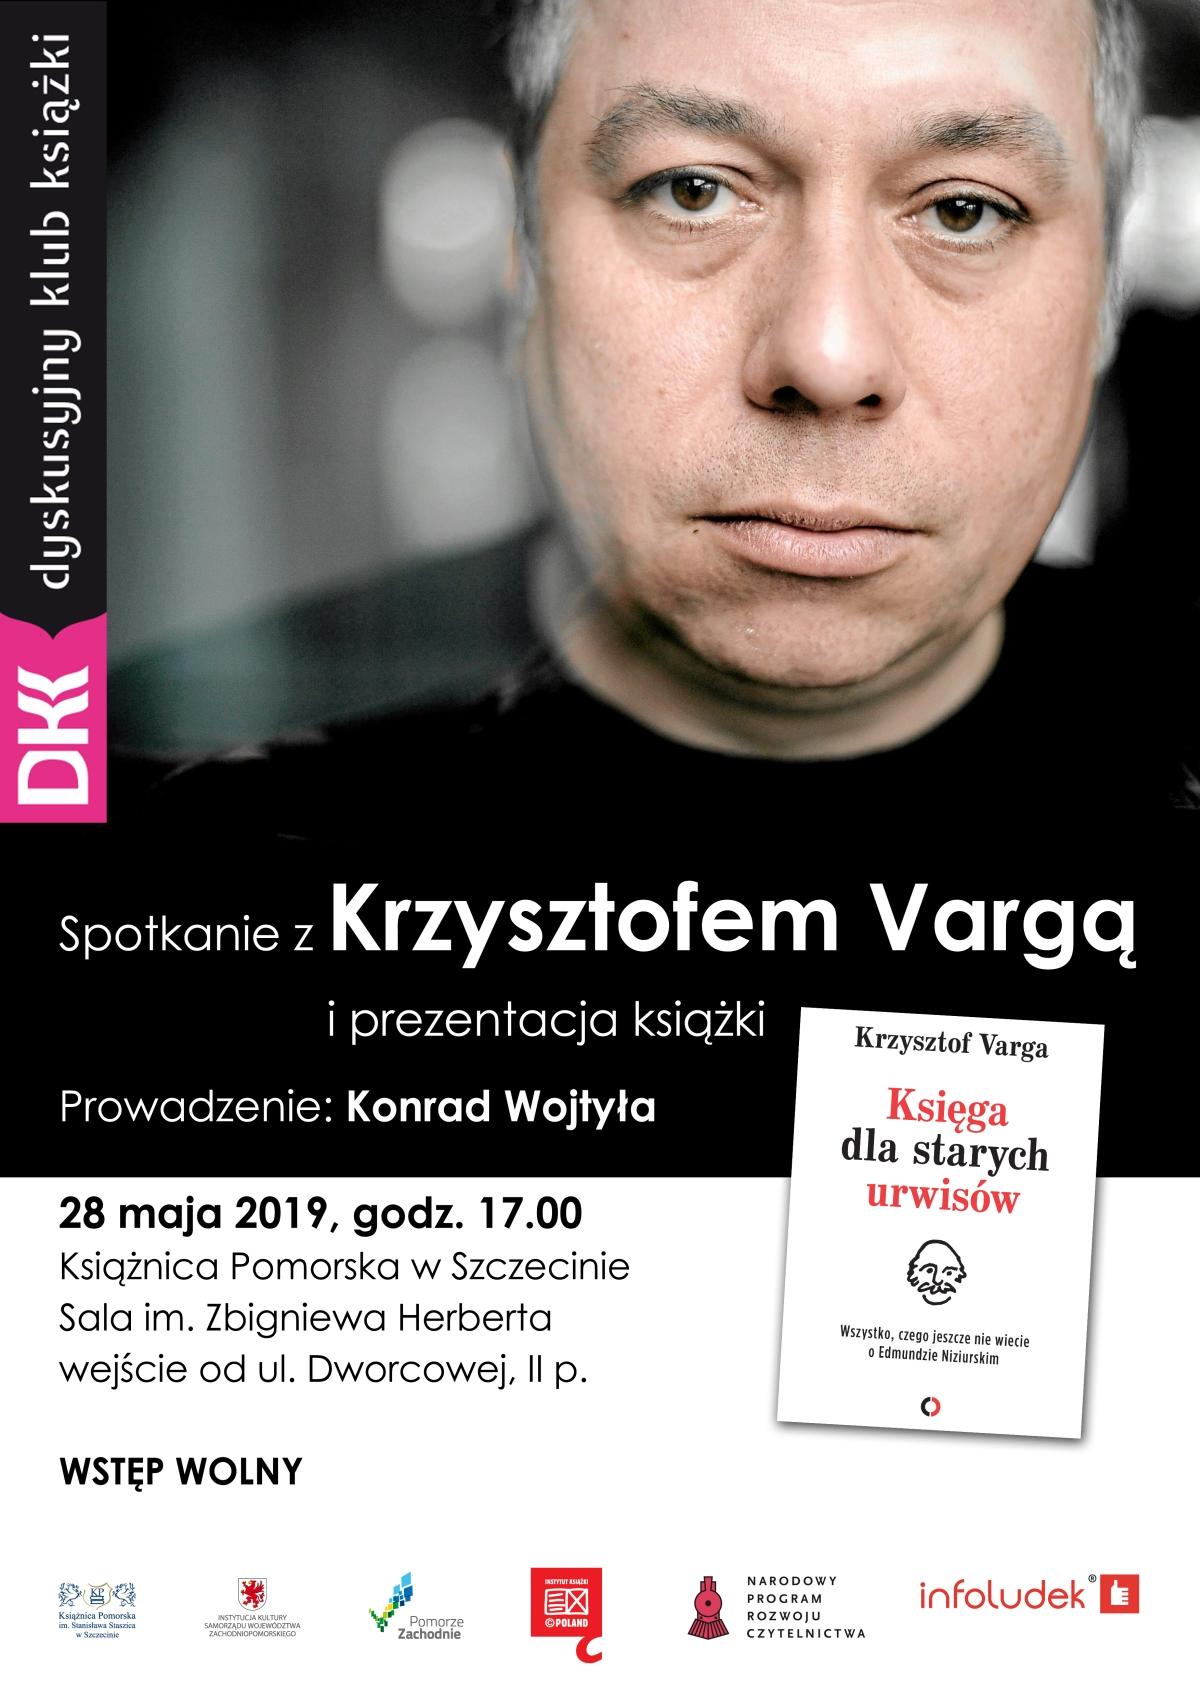 Krzysztof Varga Książnica Pomorska